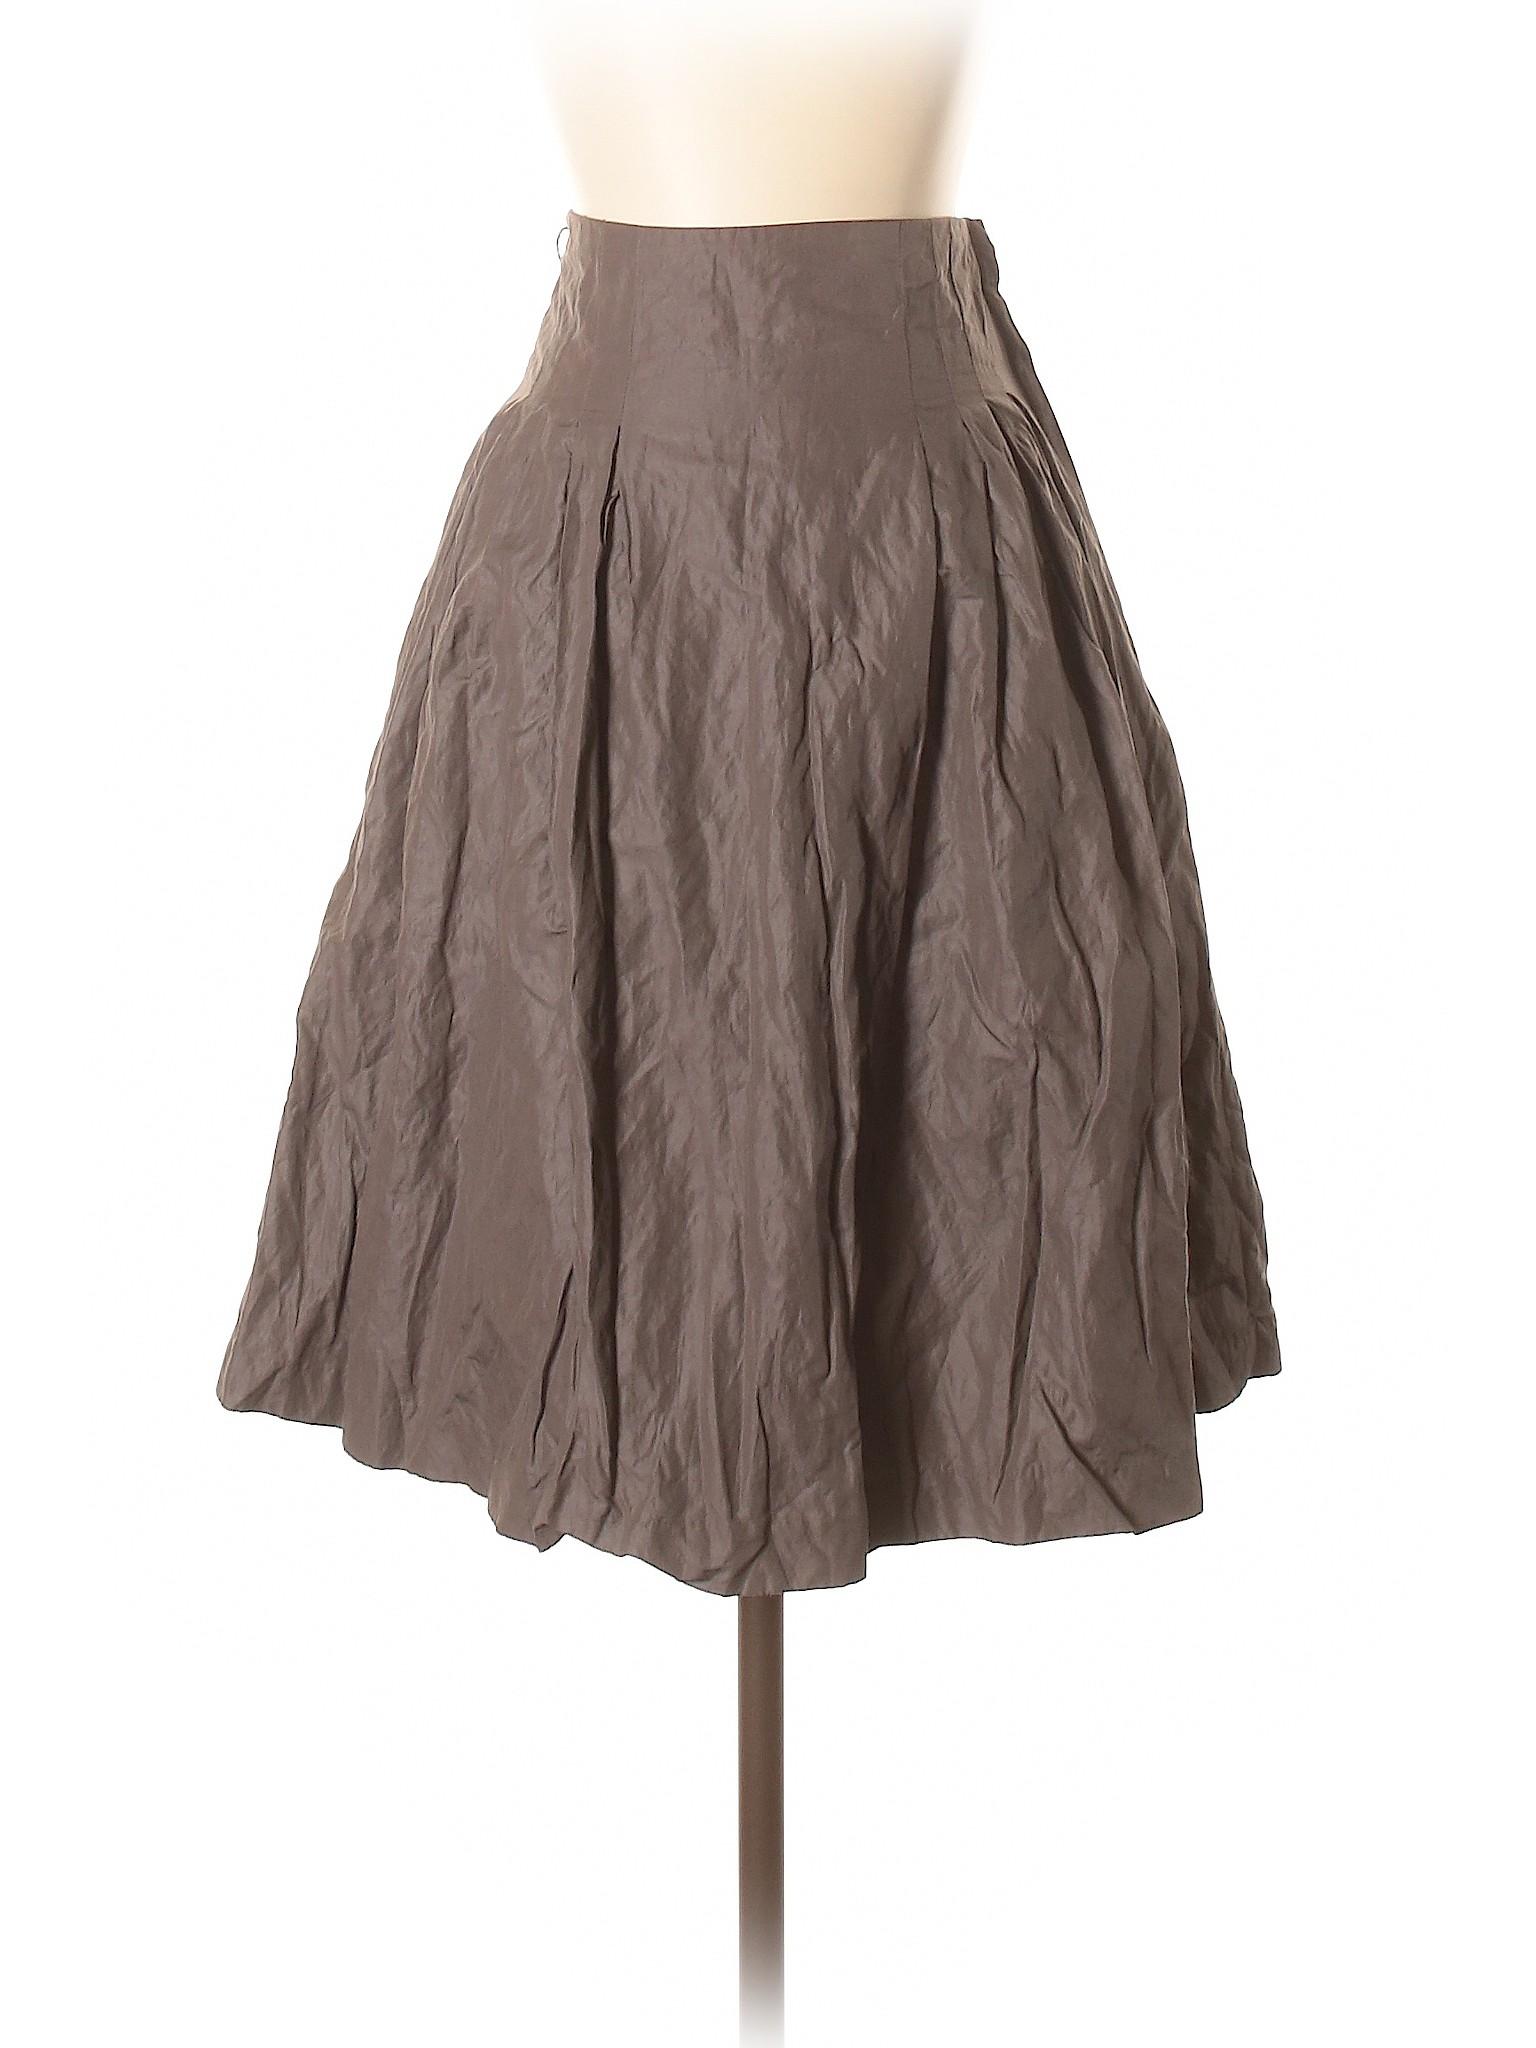 Boutique Casual Boutique Casual Skirt qPqpCH